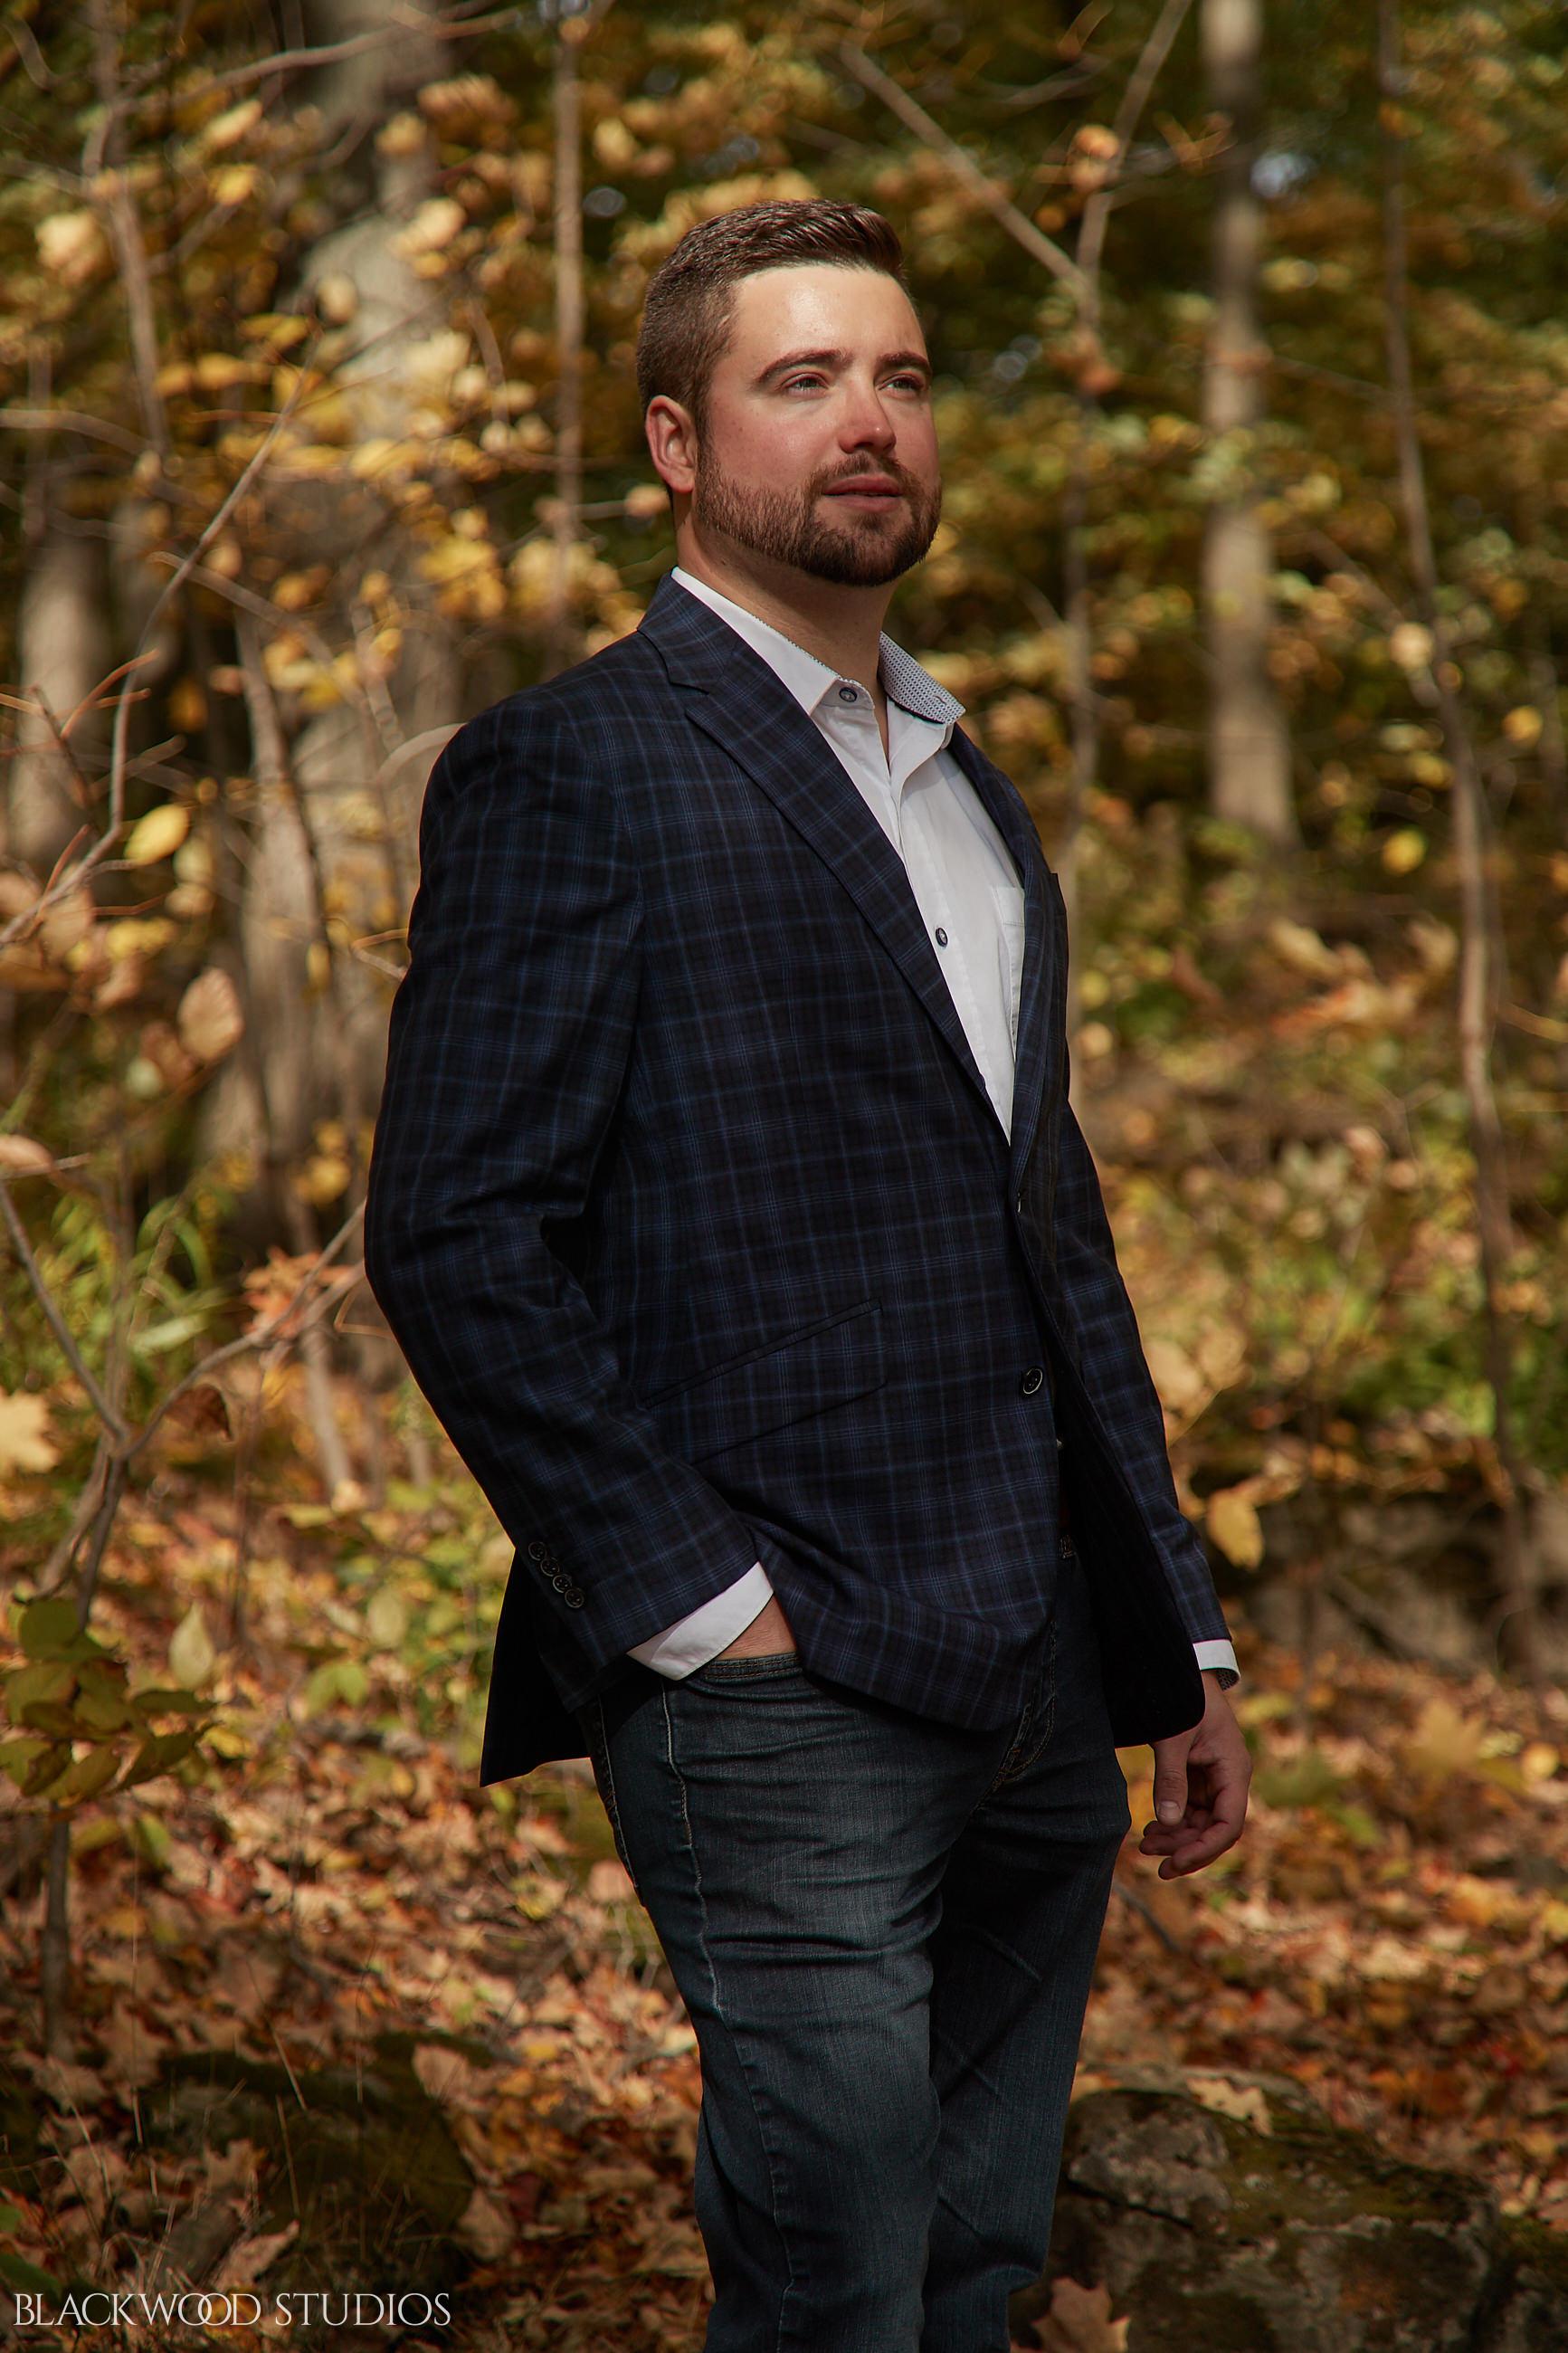 Blackwood-Studios-20181014-151913-Dave-and-Natalie-Engagement-0236-Rattlesnake-Point-Conservation-Area-Milton-Ontario.jpg